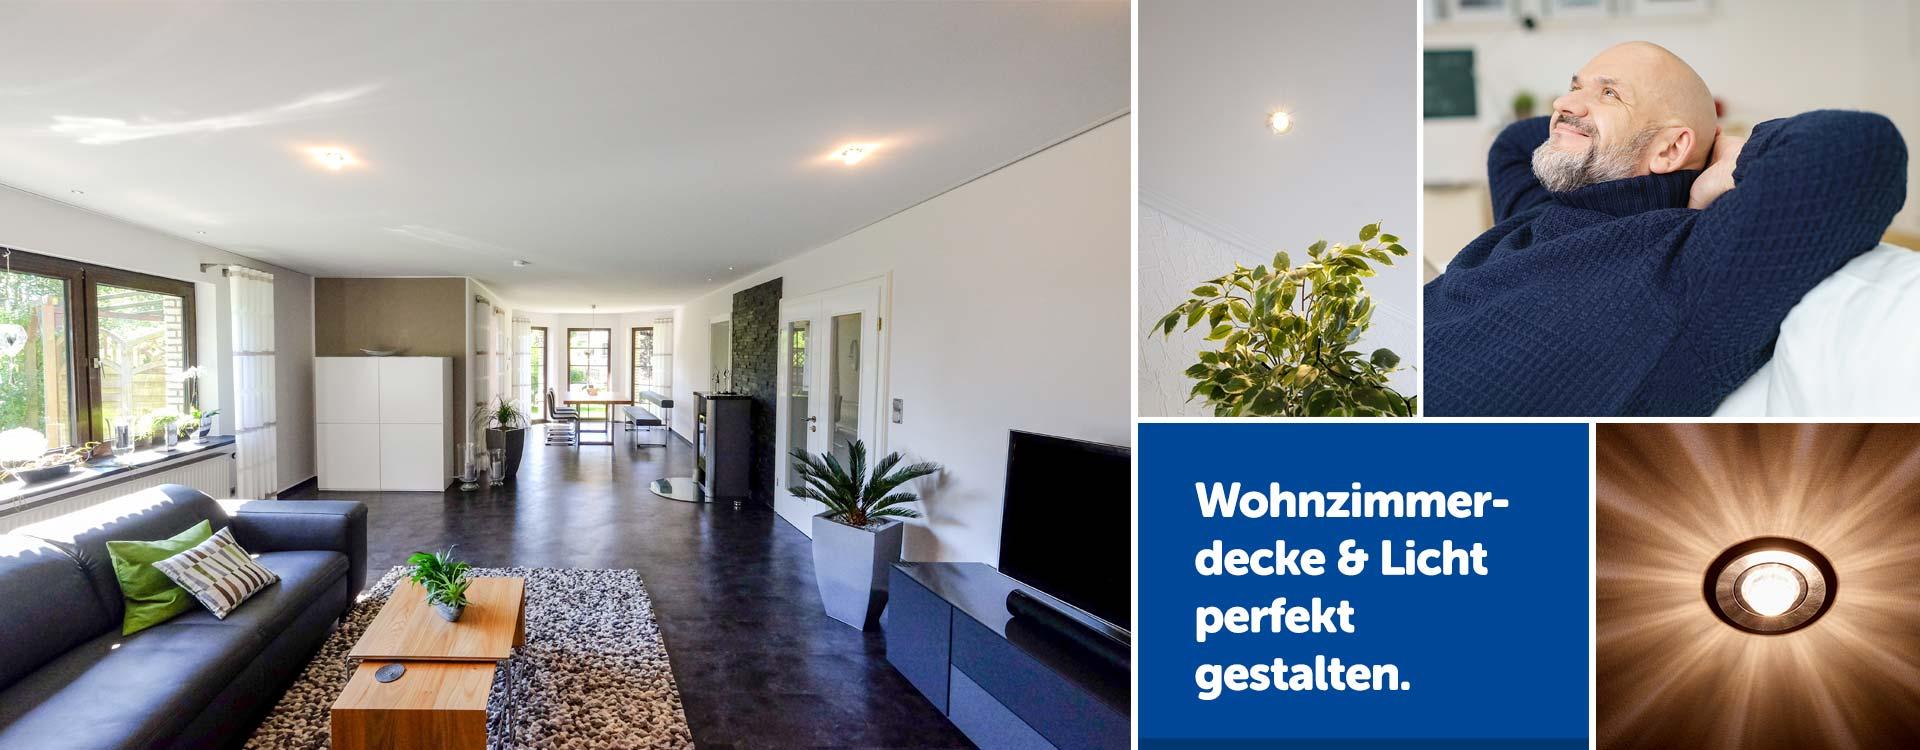 Flur Decke Verkleiden   Badezimmer Decken Design Ideen Fur ...